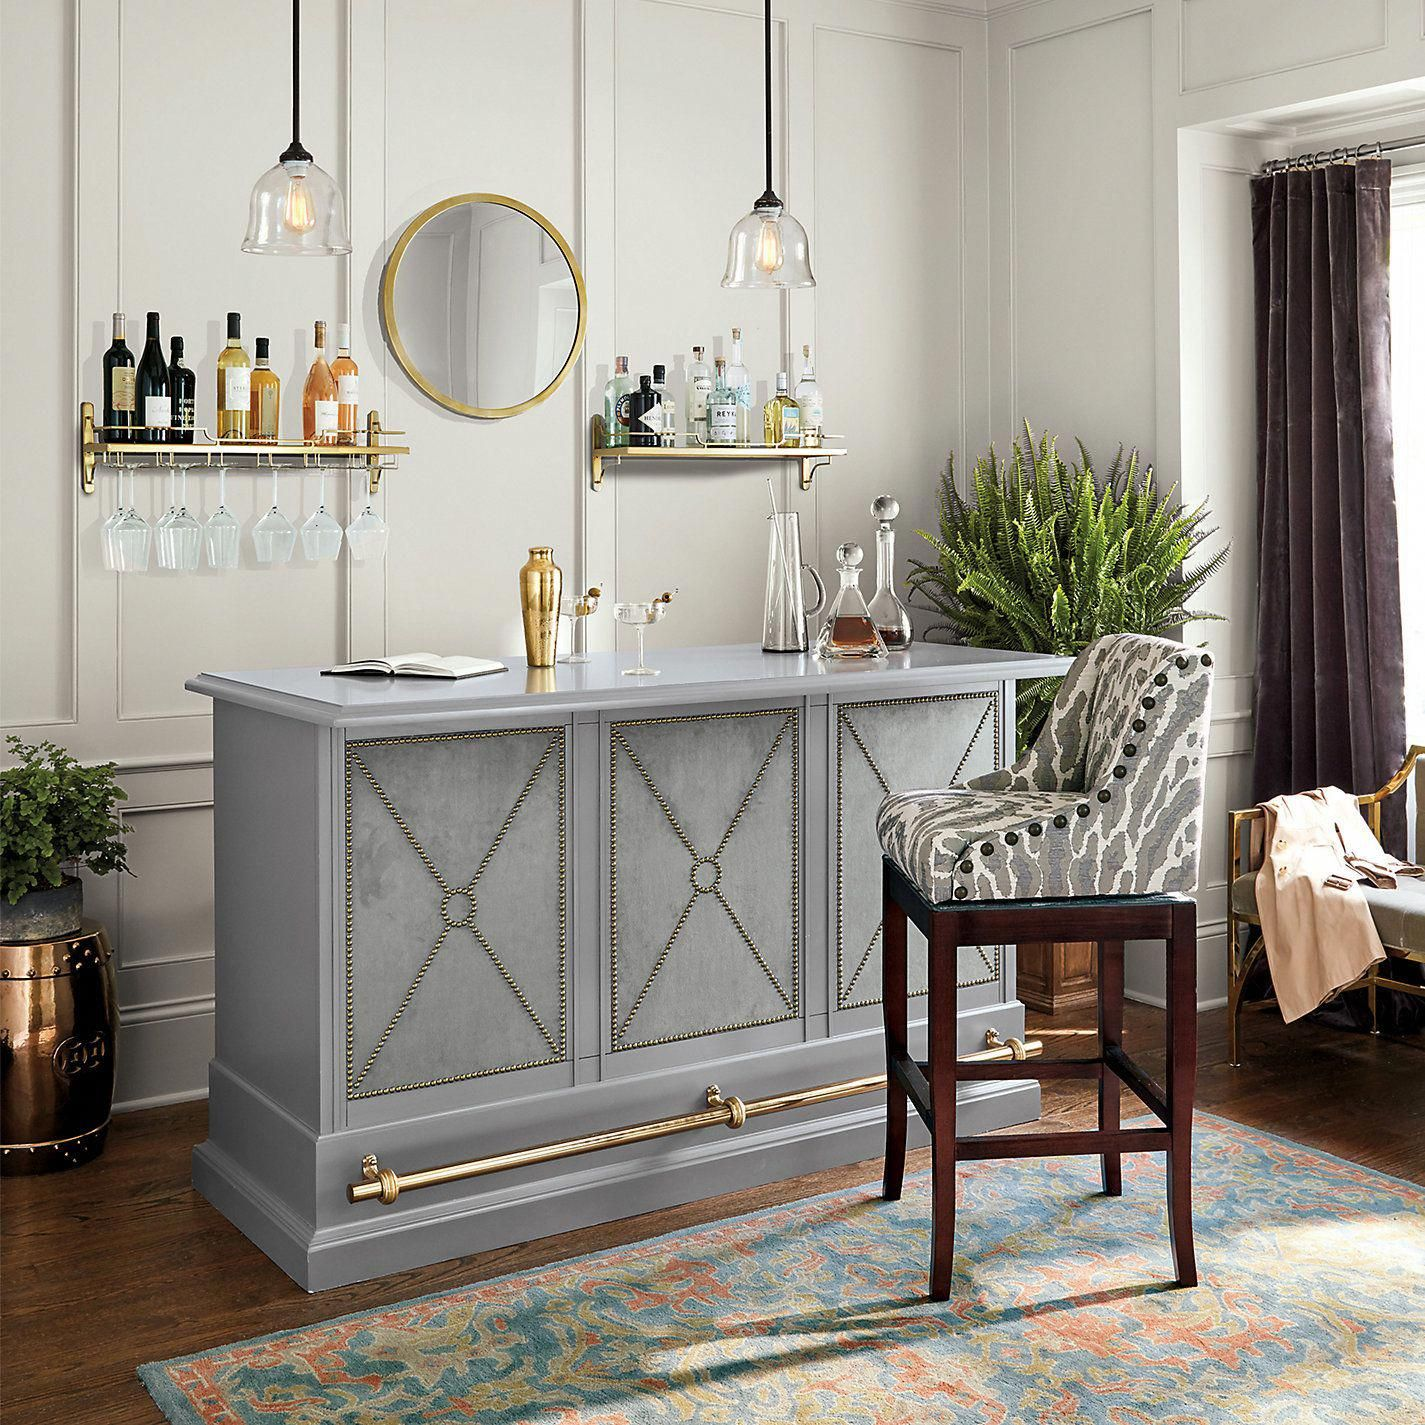 Living Room Bar Ideas: Ballard Designs Comptons Bar #decorforhomebarroom